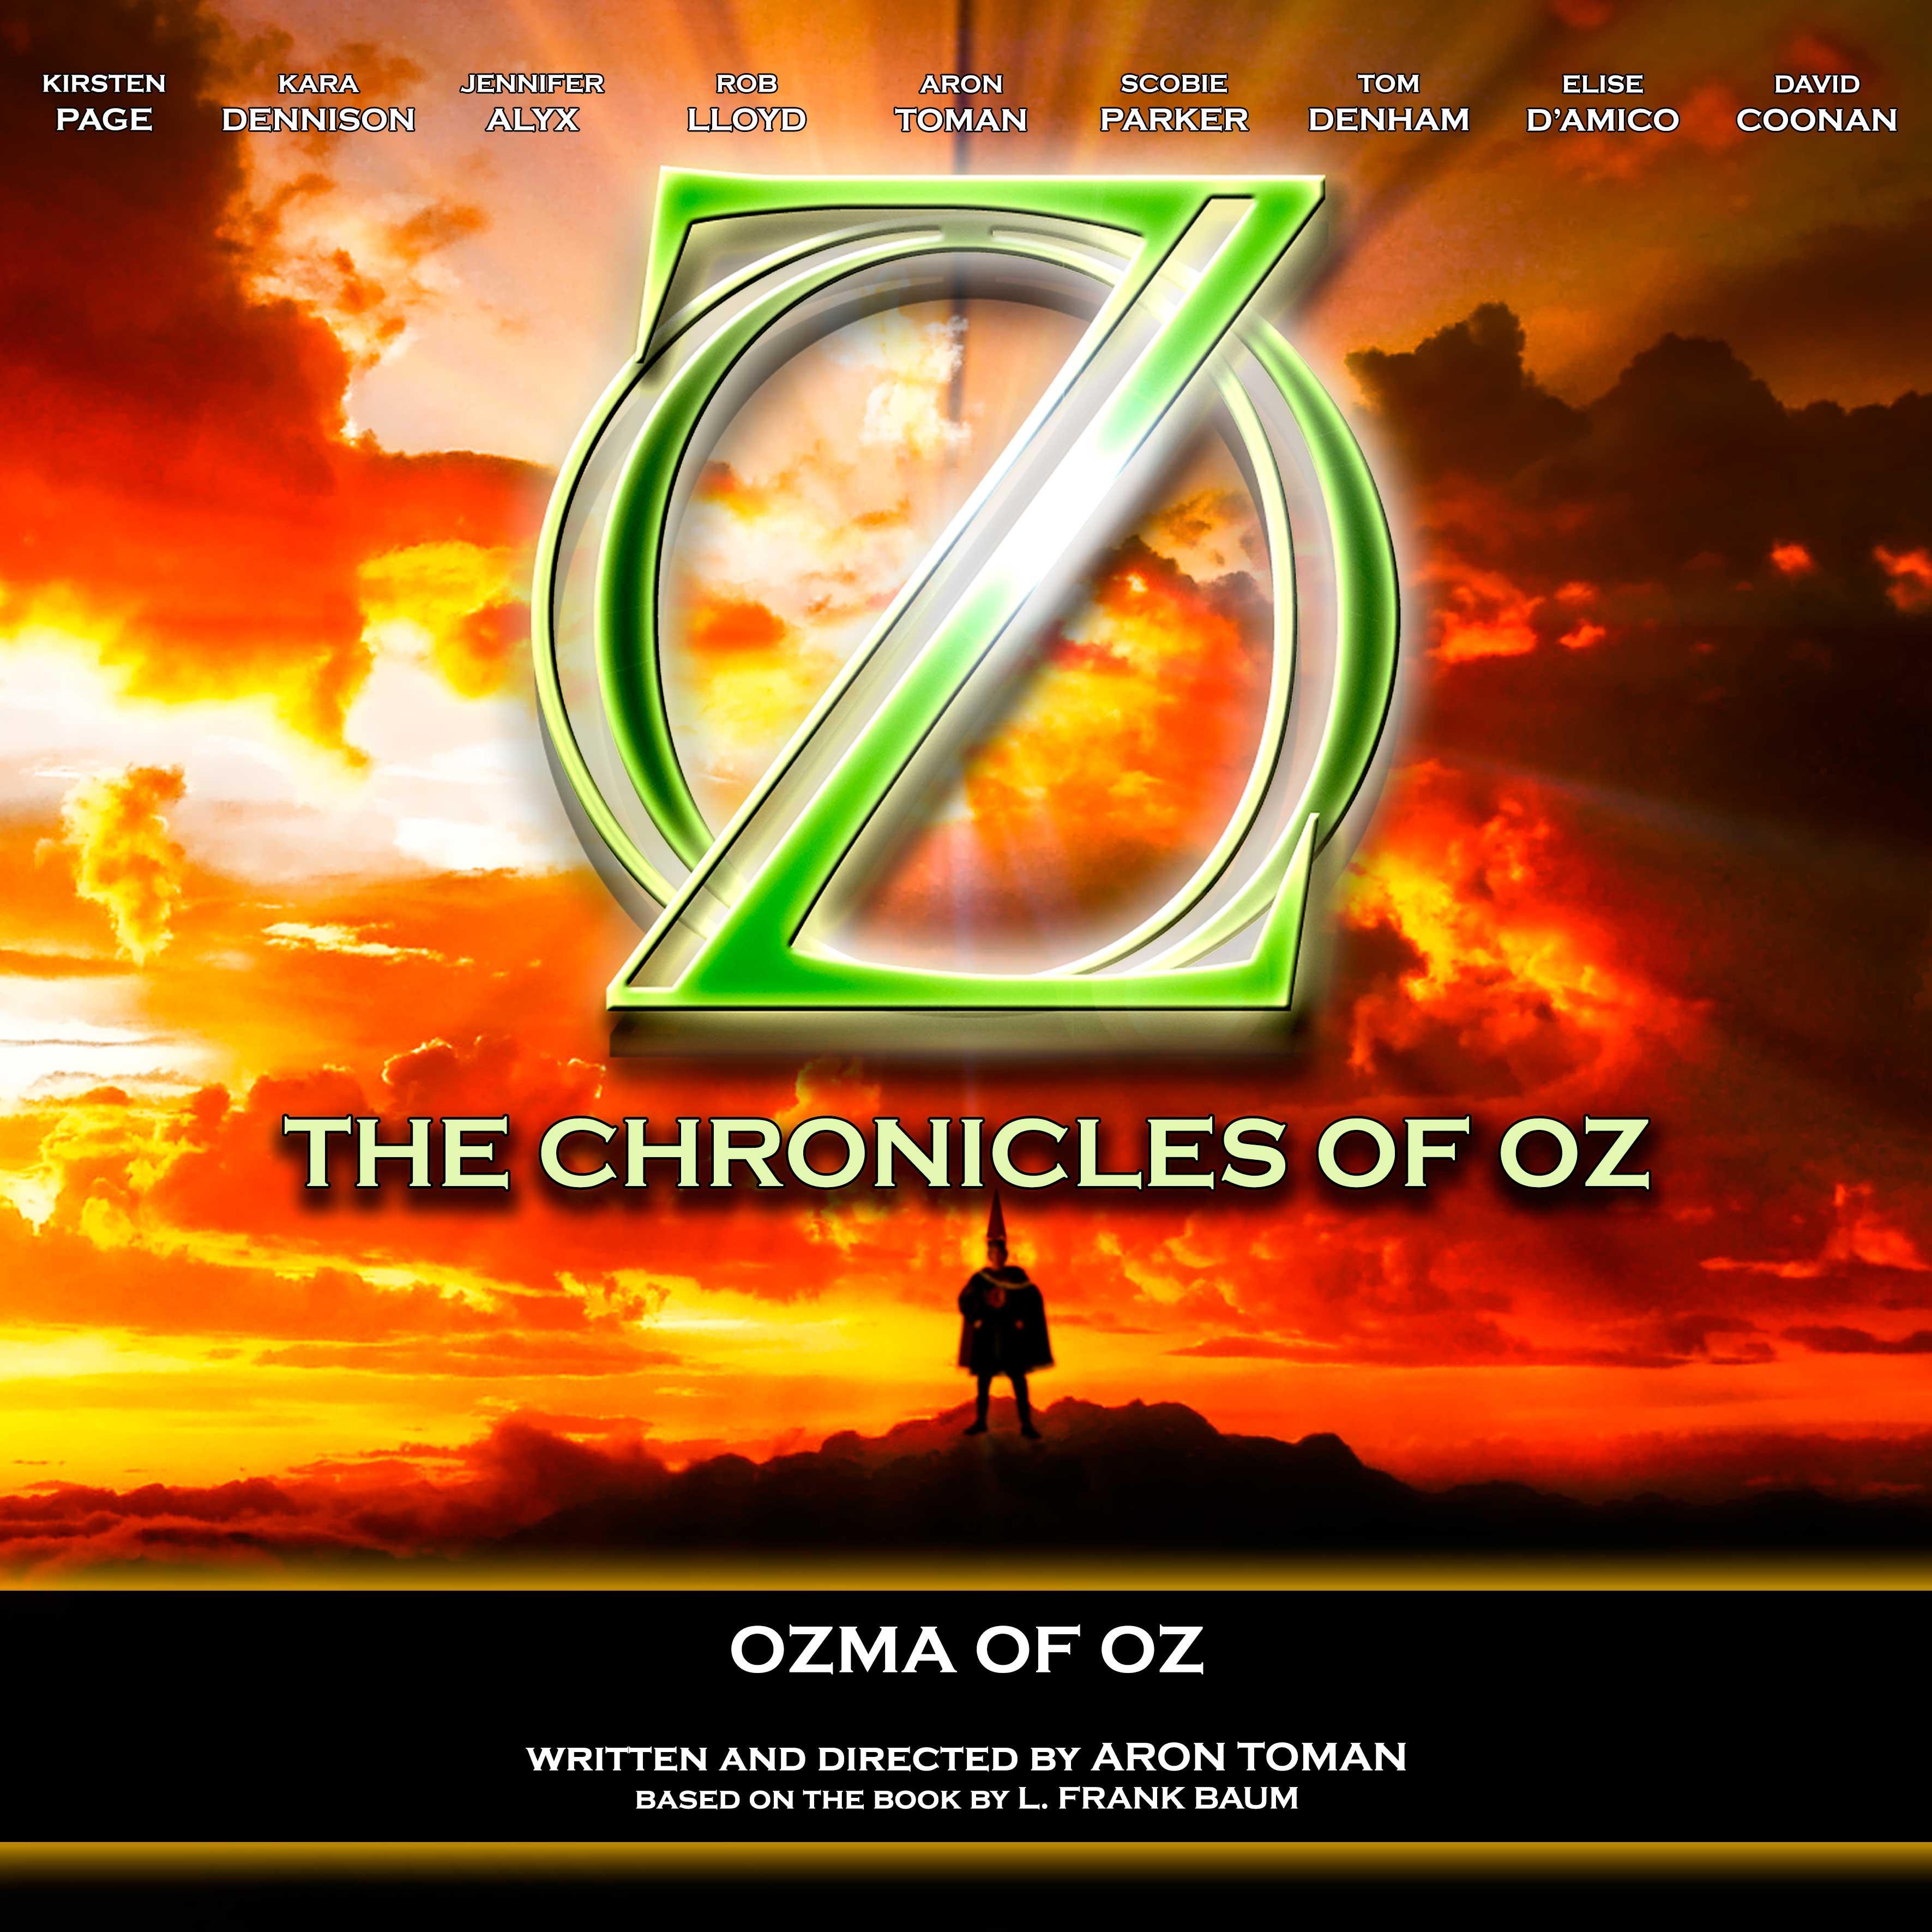 Trailer - Ozma of Oz - Episode 5